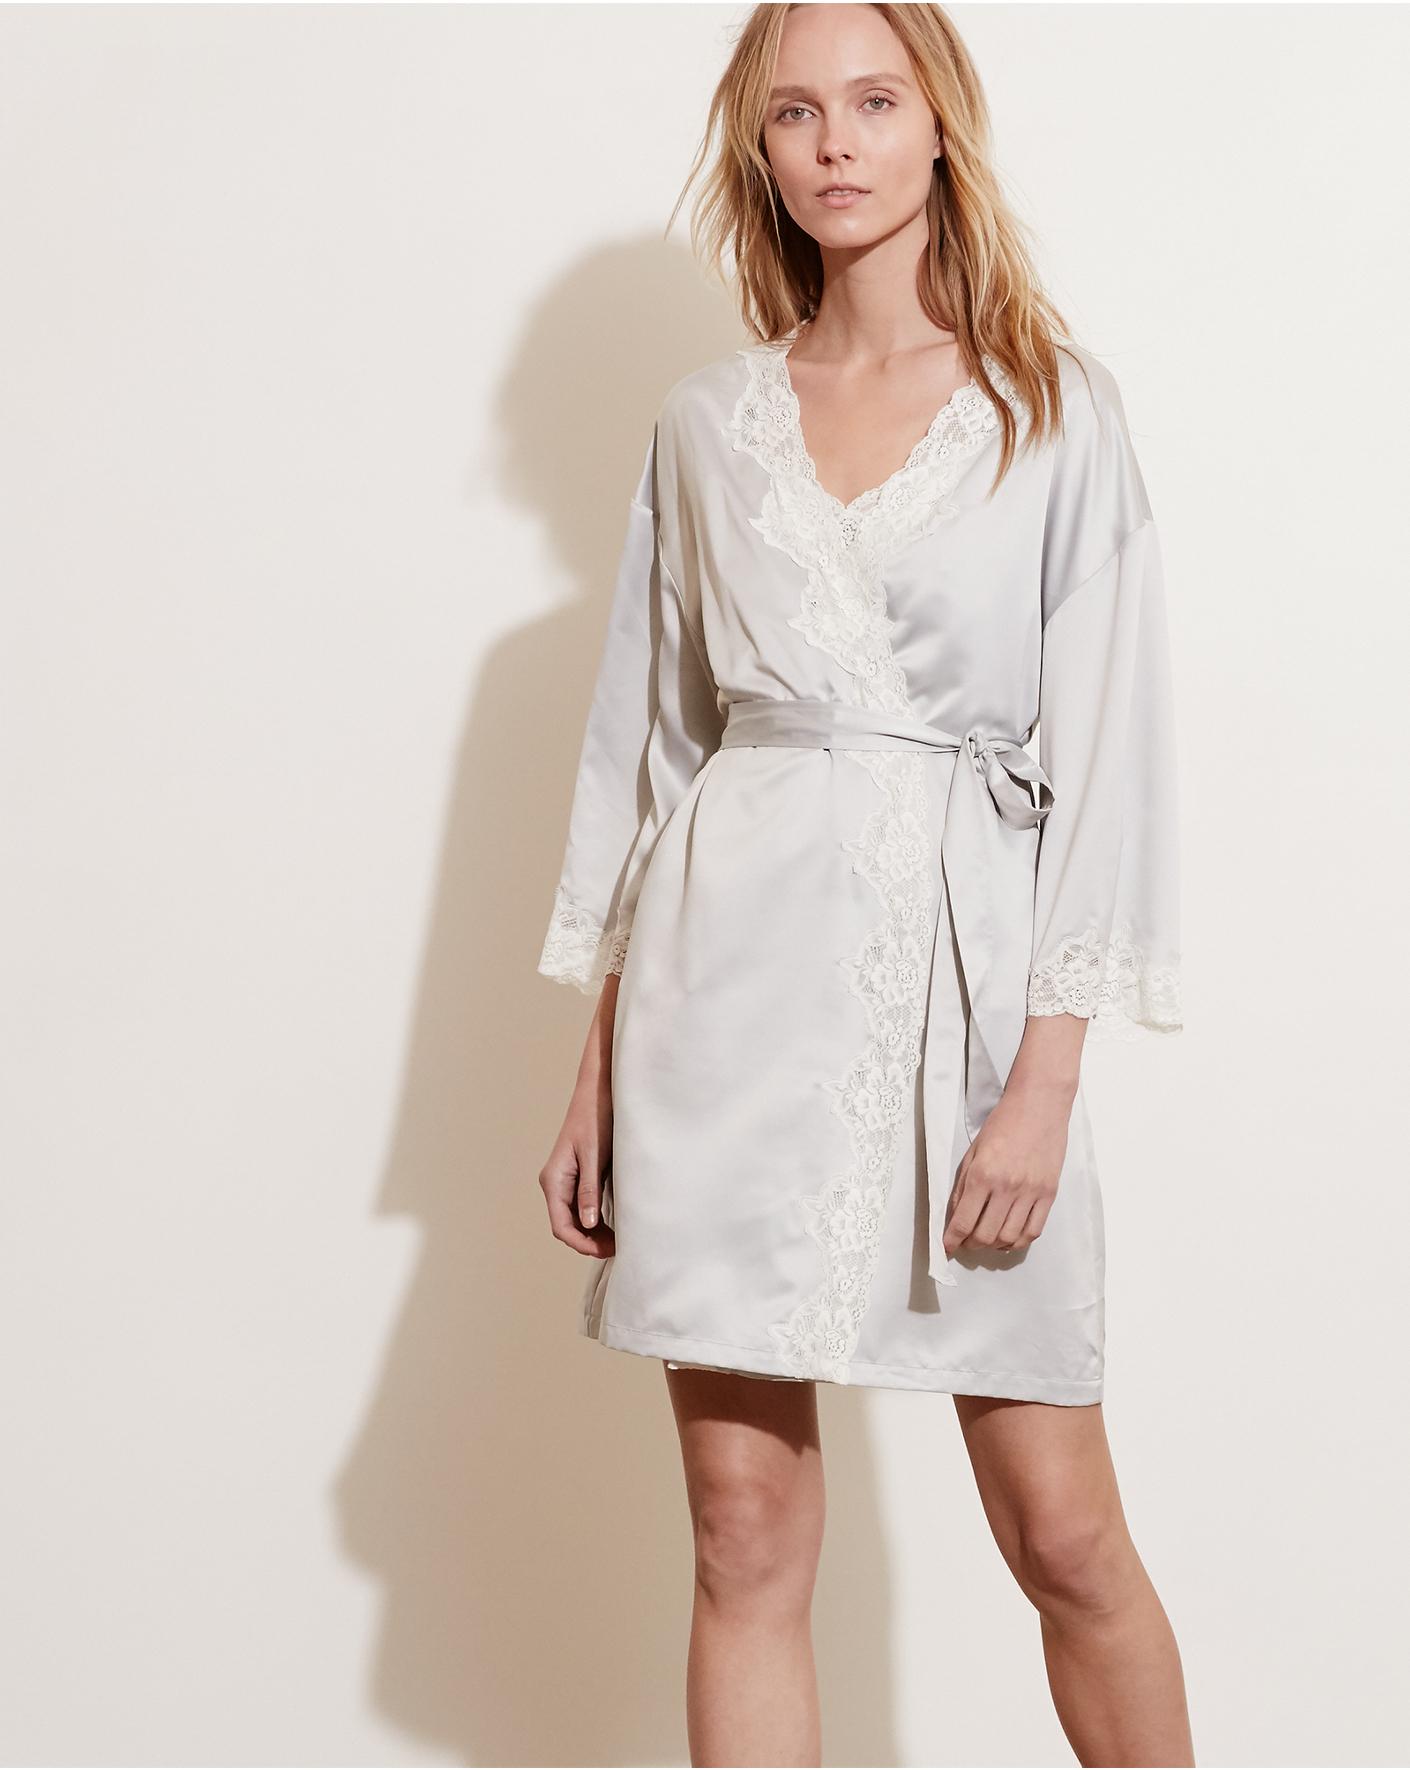 Women's Sleepwear, Pajamas, Pajama Sets, & Robes | Ralph Lauren